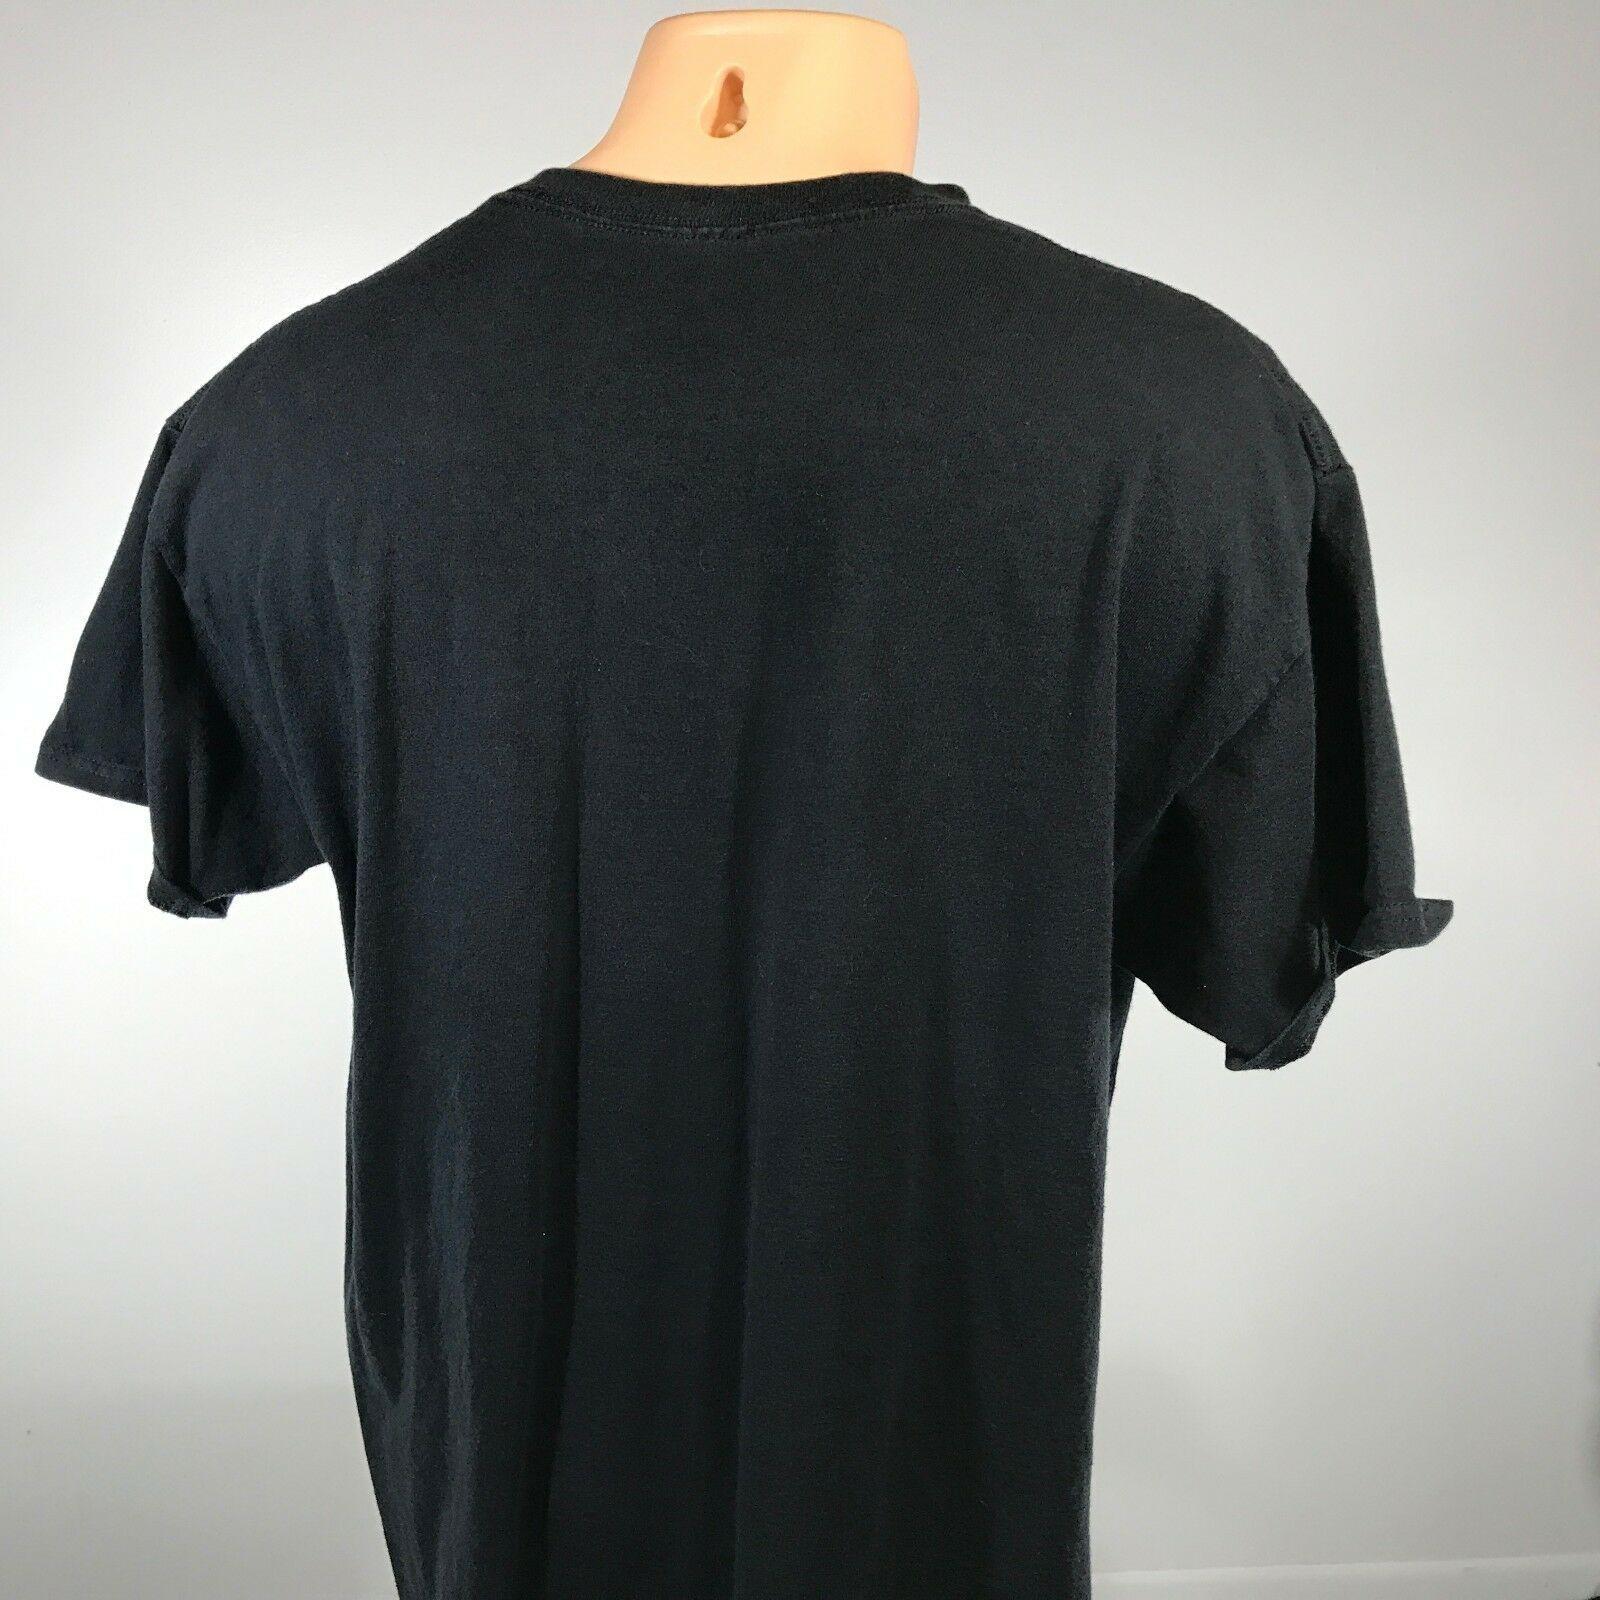 Atari L T Shirt Size Large Black Short Old School Player Gaming